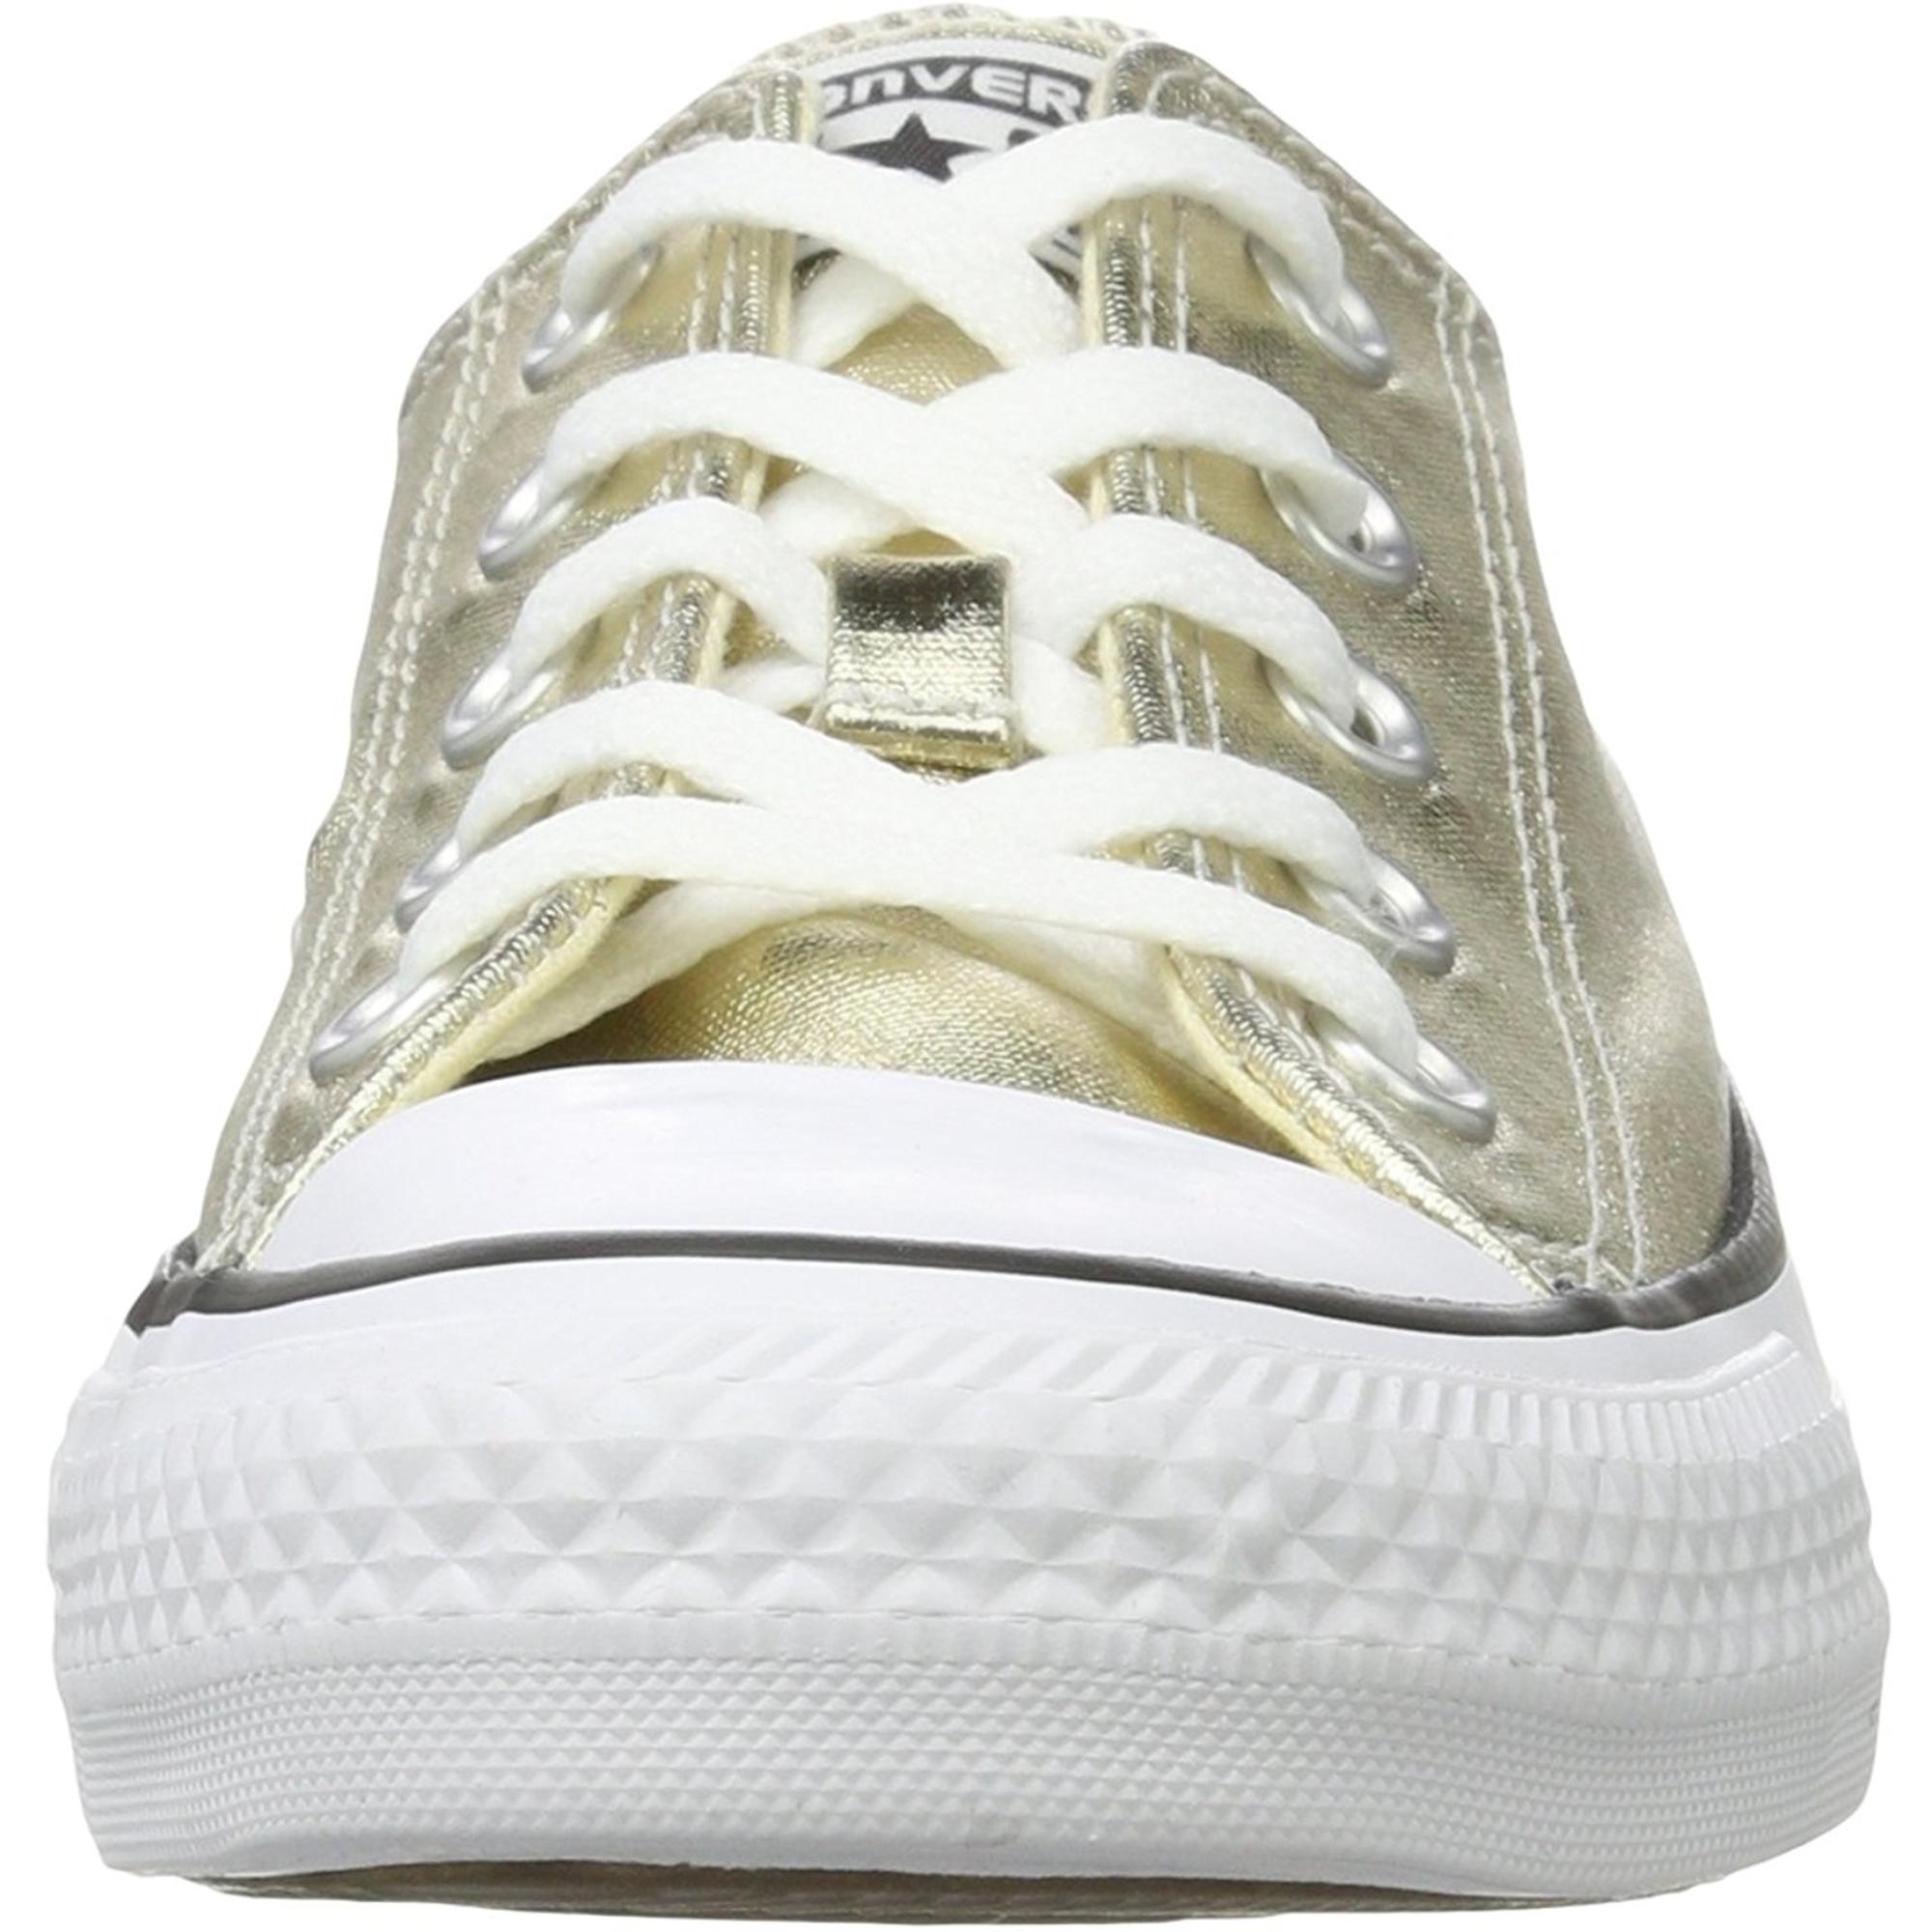 Converse Chuck Taylor All Star Ox Light Gold Textile Adult